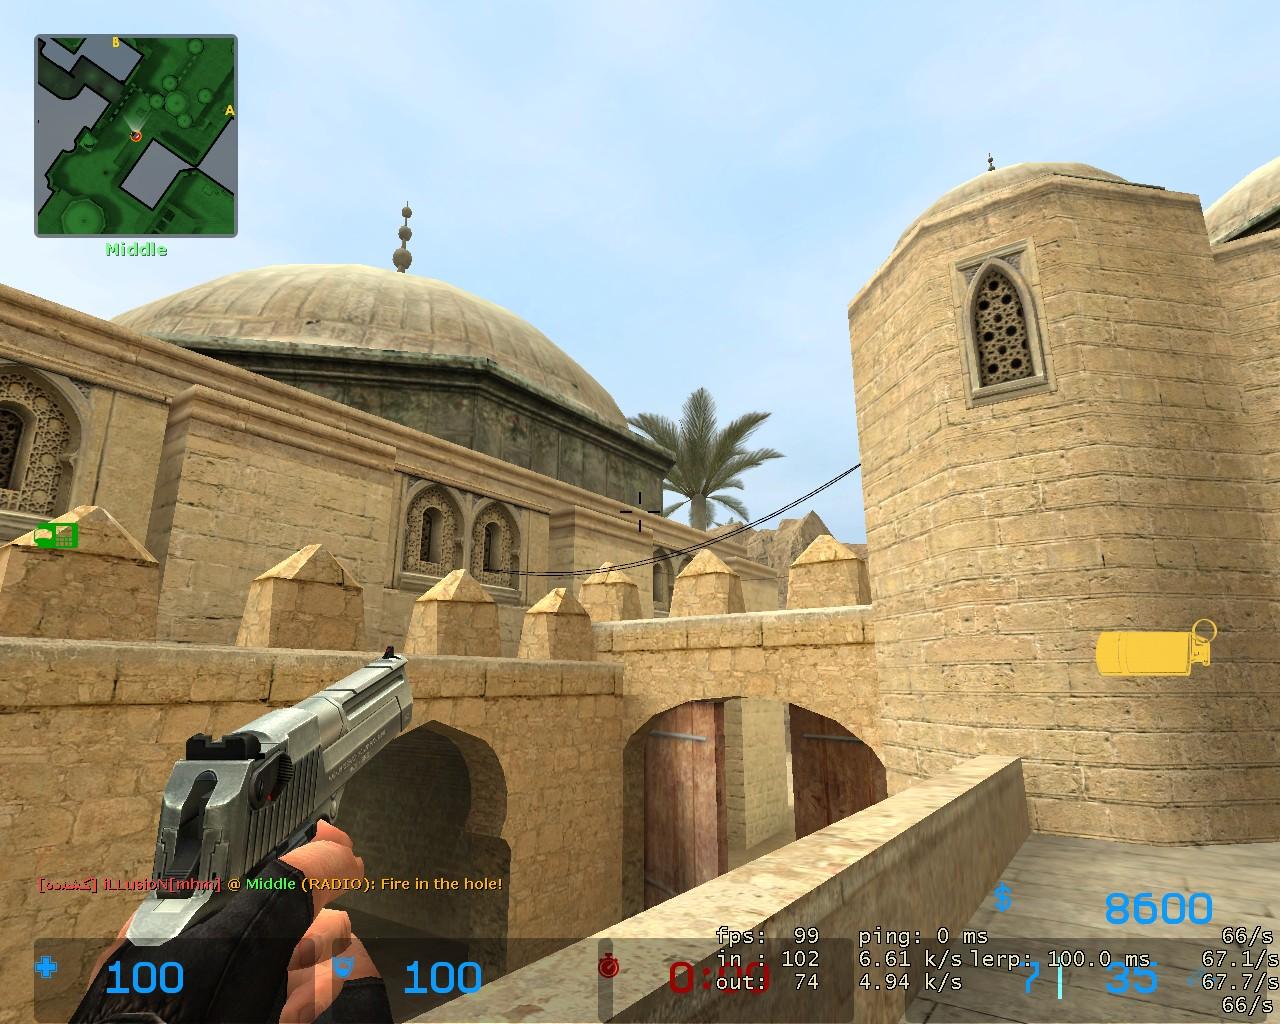 New BF2-de_dust2-ct-spawn-mid-jpg